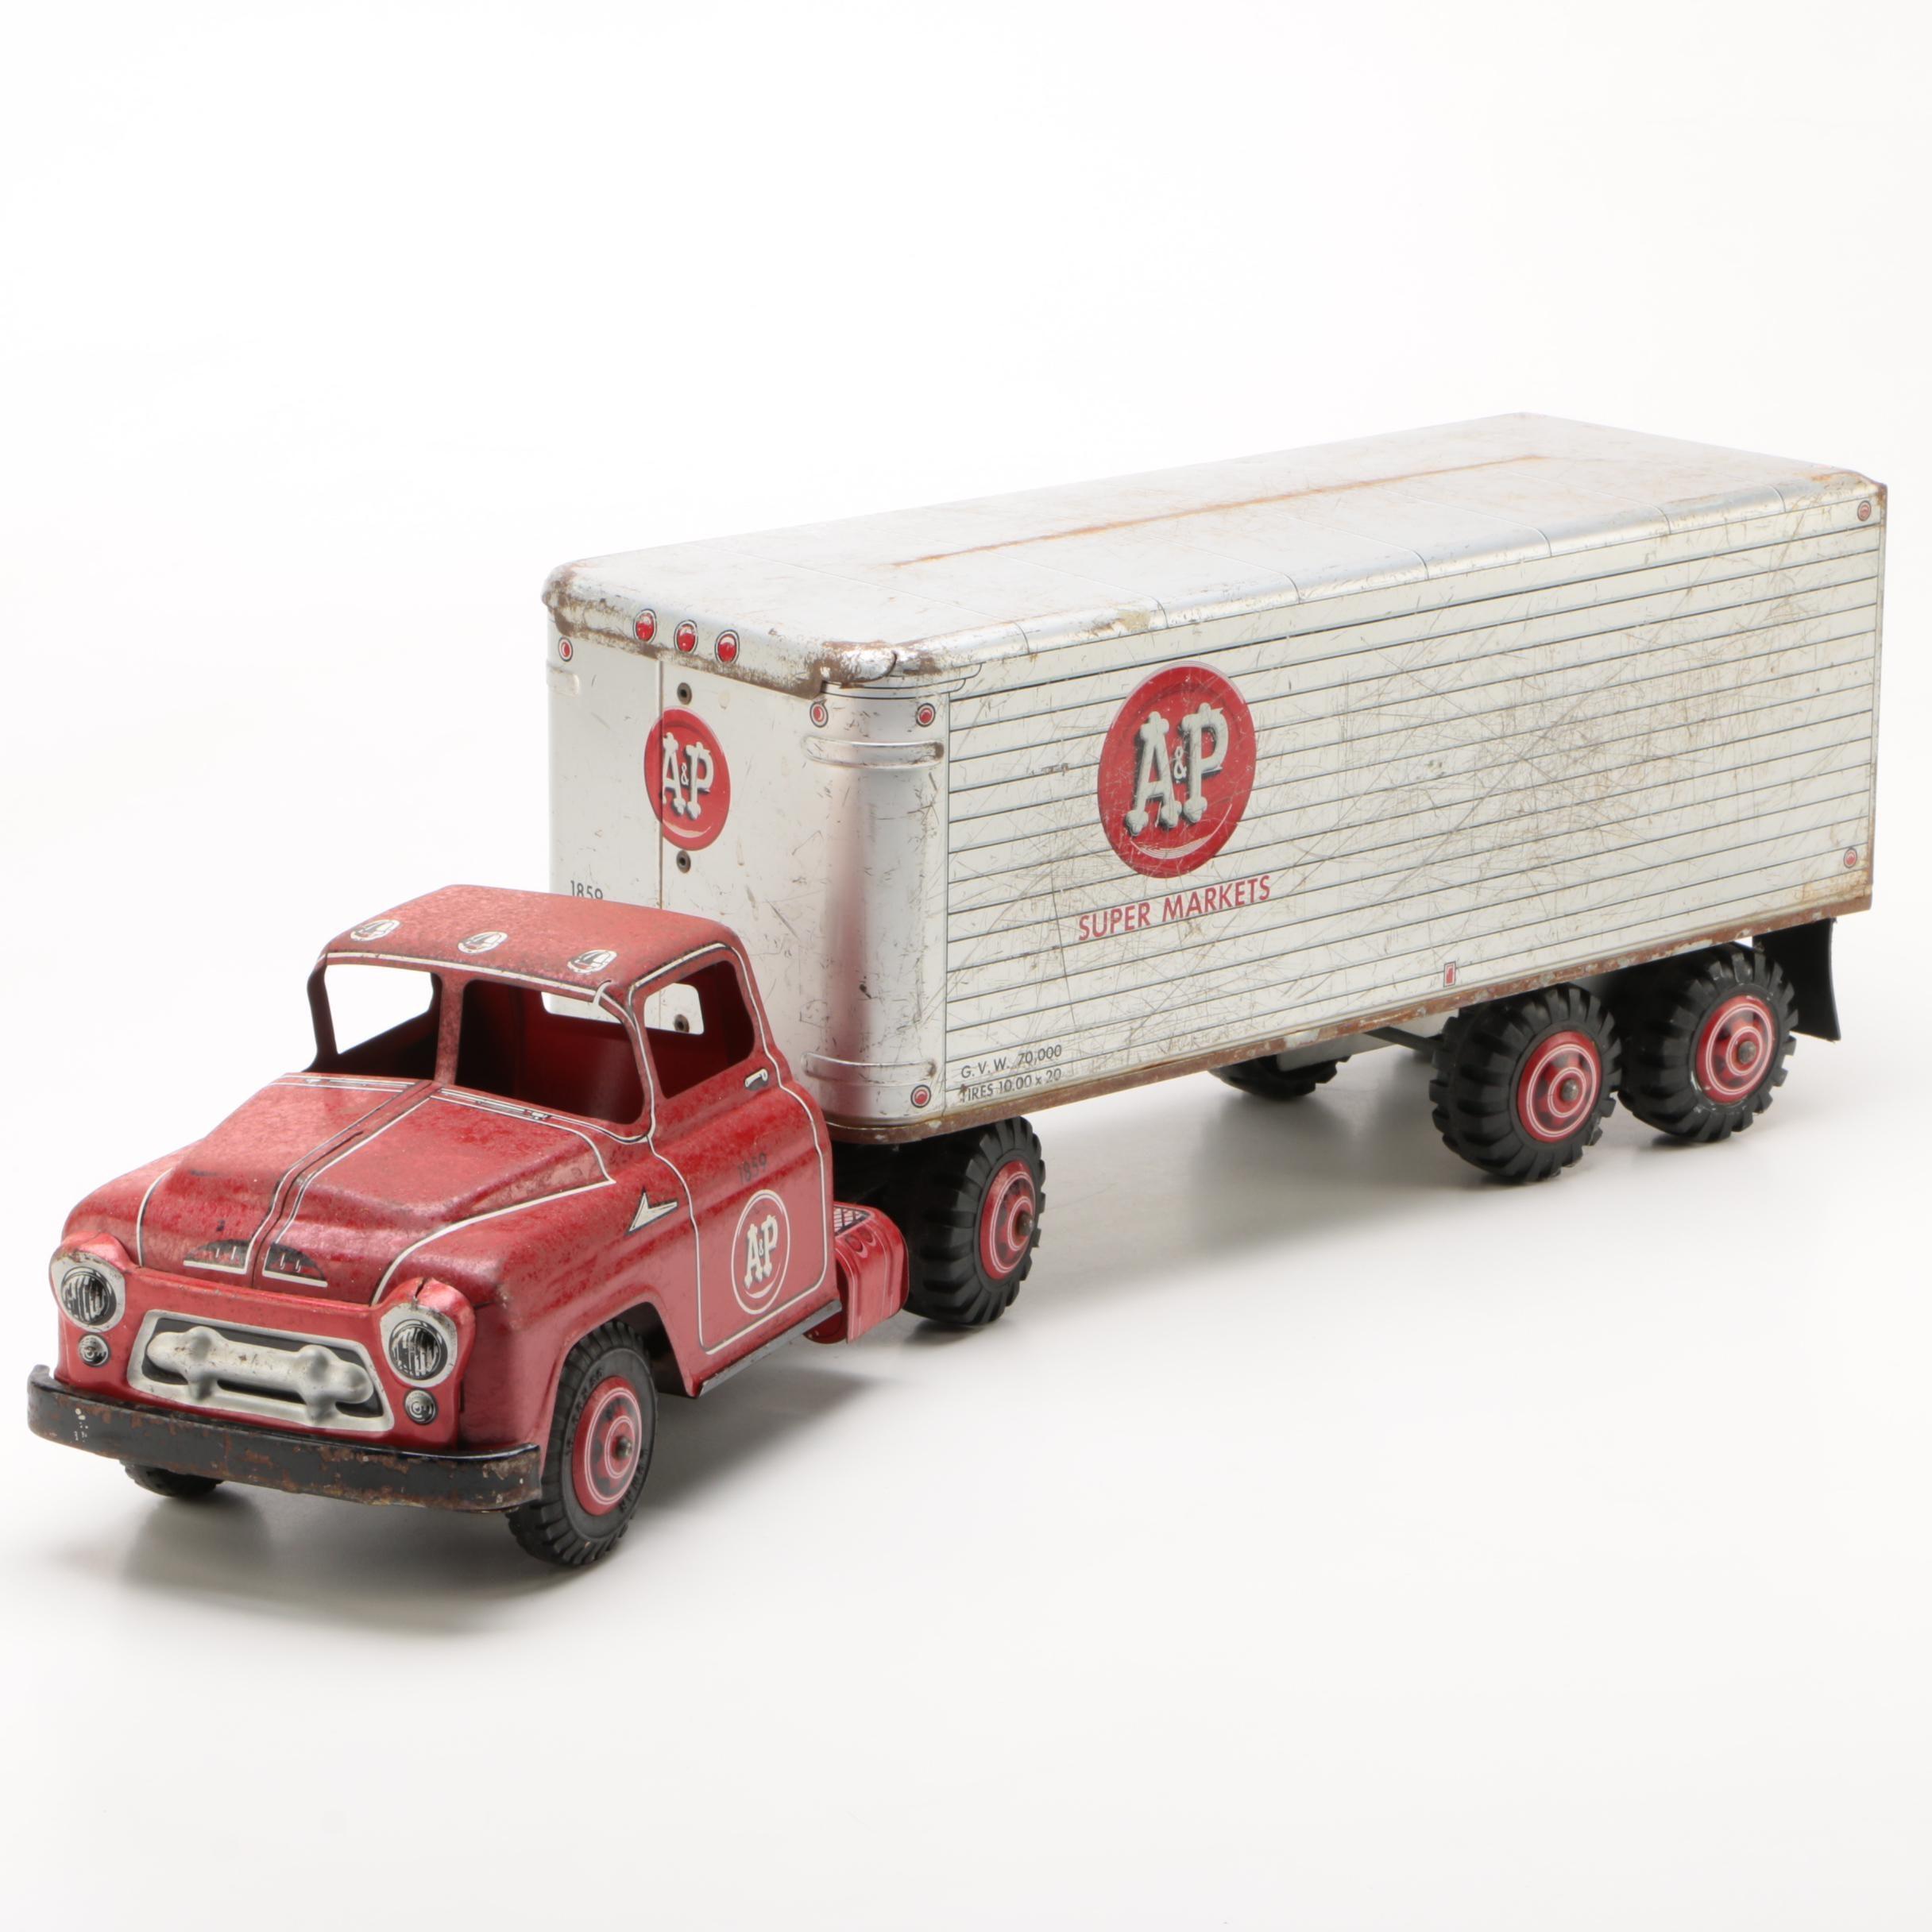 Louis Marx & Co. Printed Tin A&P Supermarkets Semi-Trailer Truck, 1950s